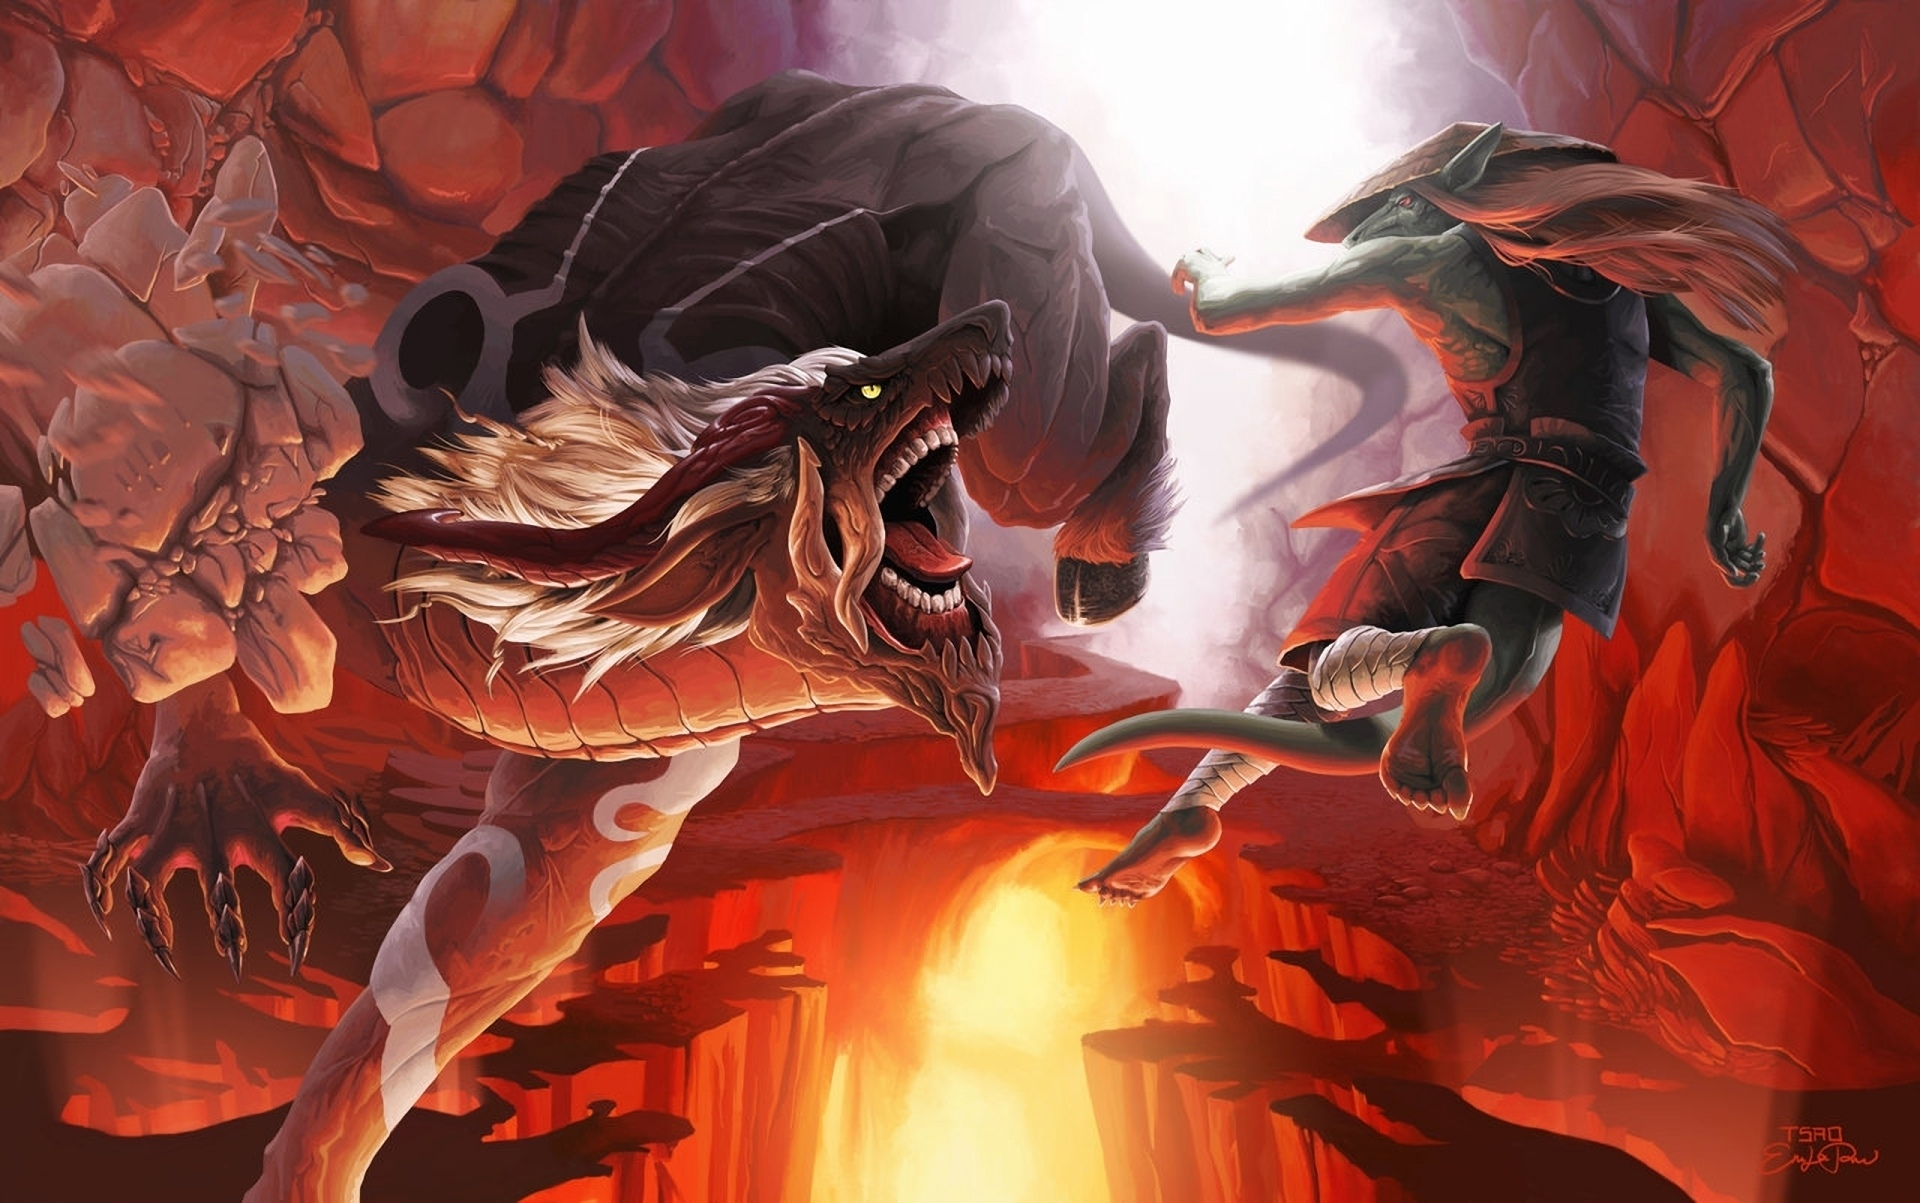 Drawn rat demonic 148546 stones monsters 1920x1203 rat